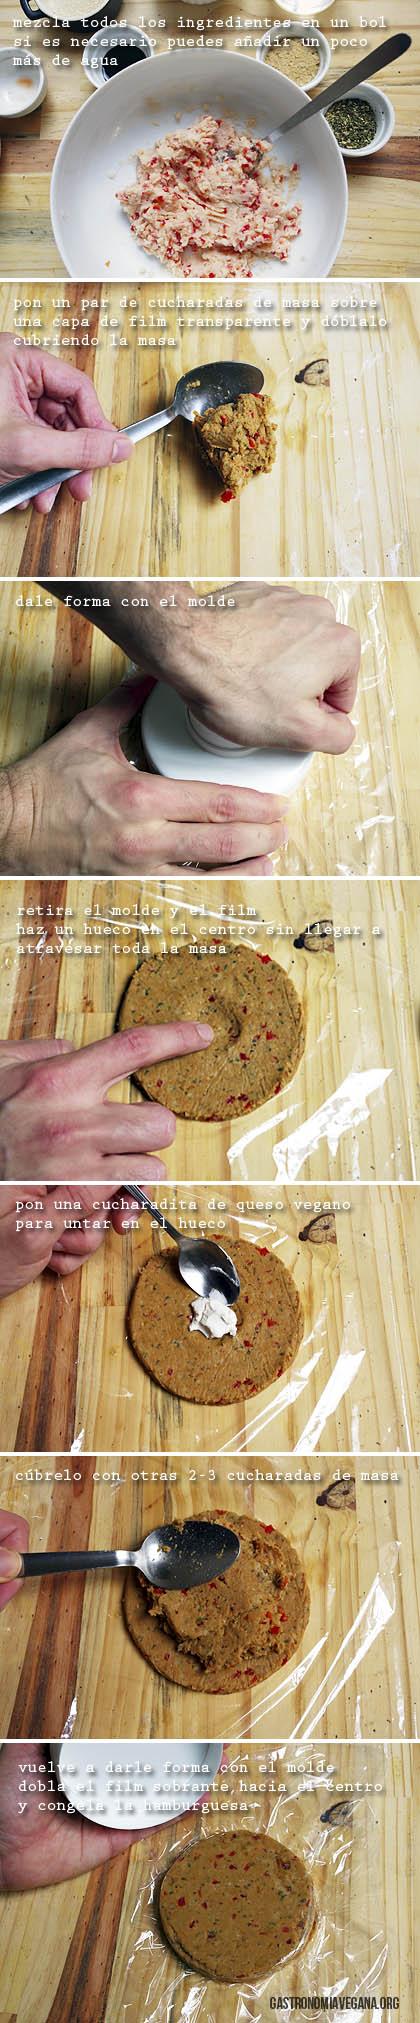 Tutorial para hacer hamburguesas veganas rellenas